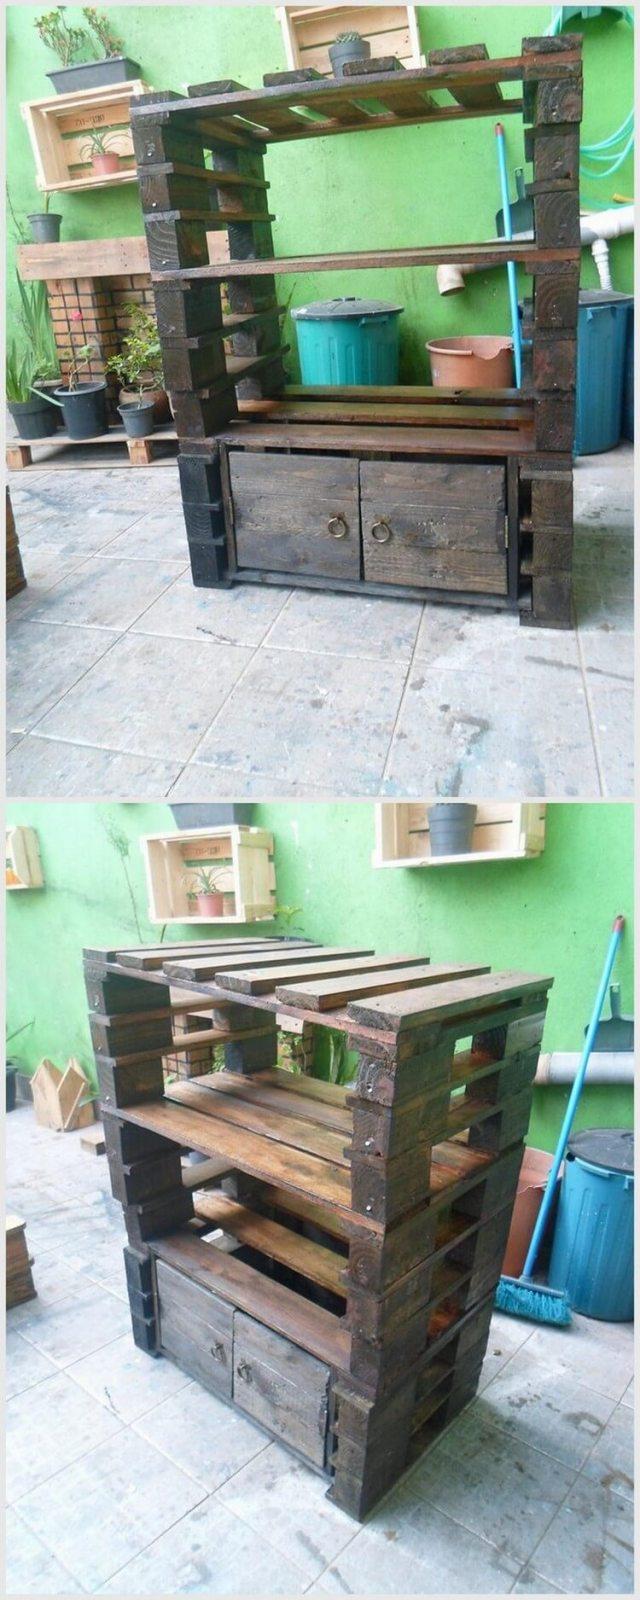 Wood Pallet Idea